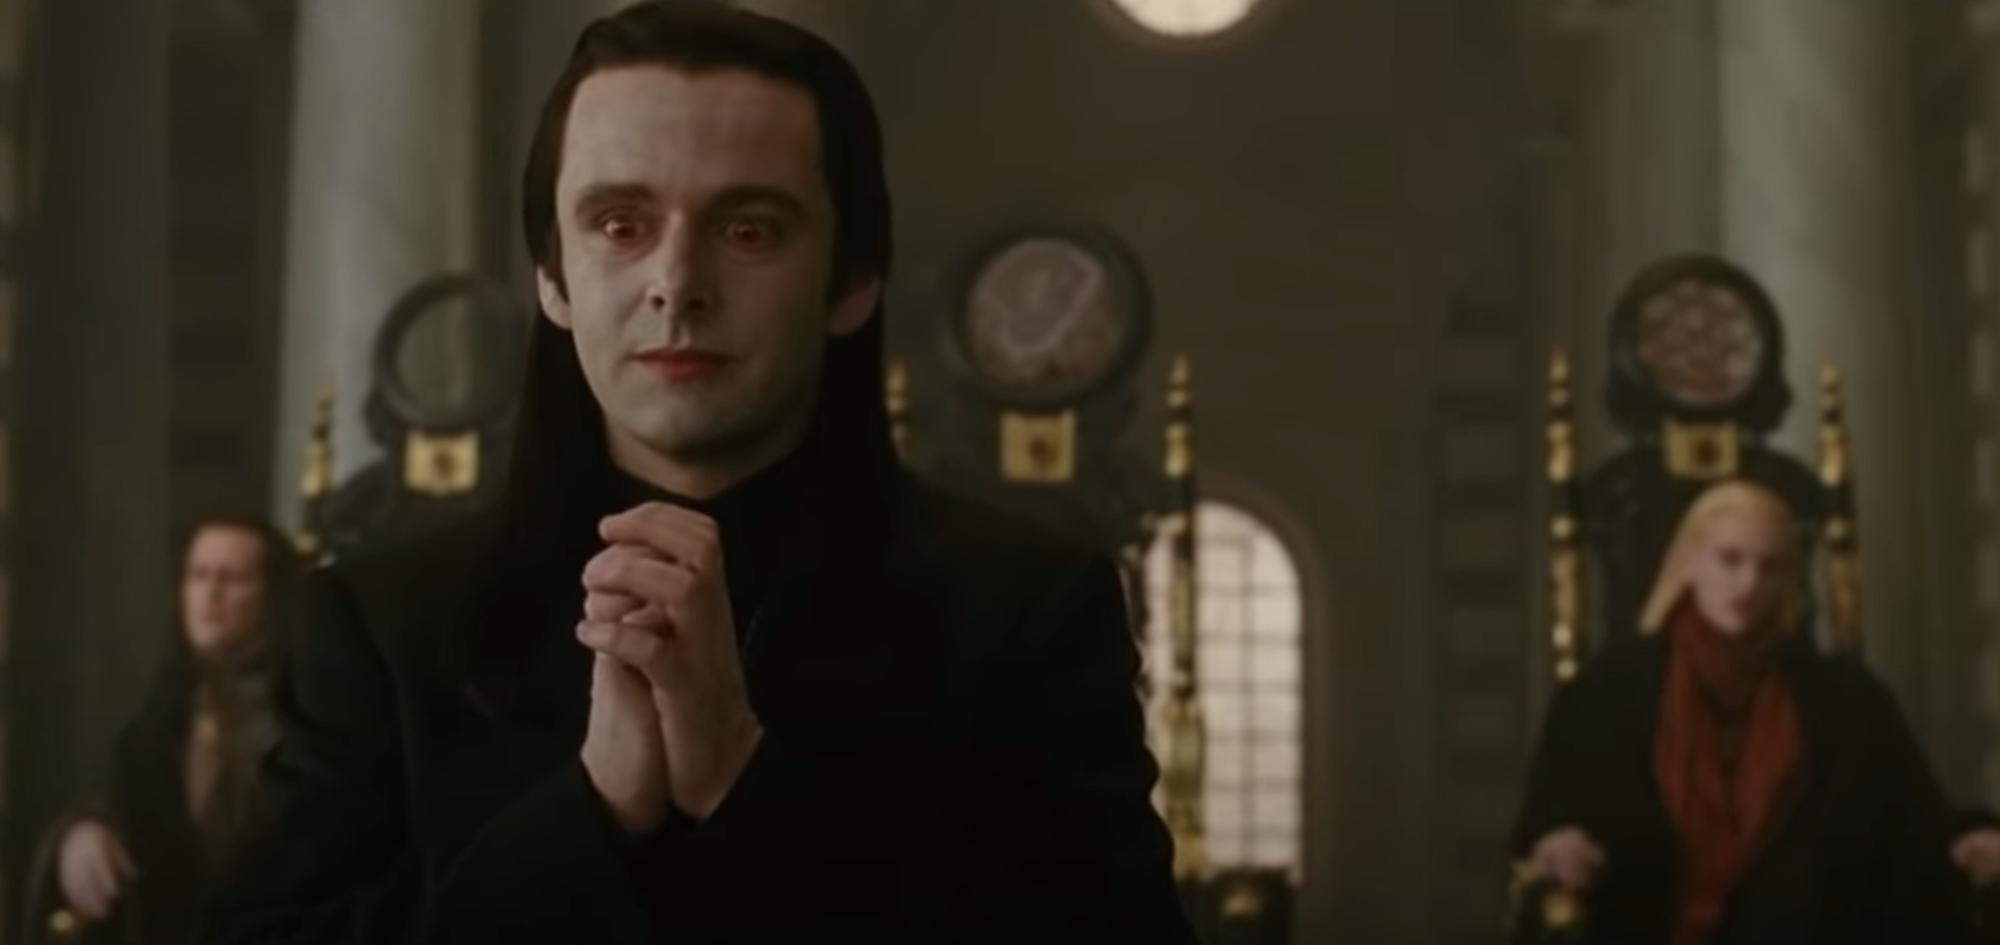 Marcus, Aro, and Caius of the Volturi in 'The Twilight Saga: New Moon'